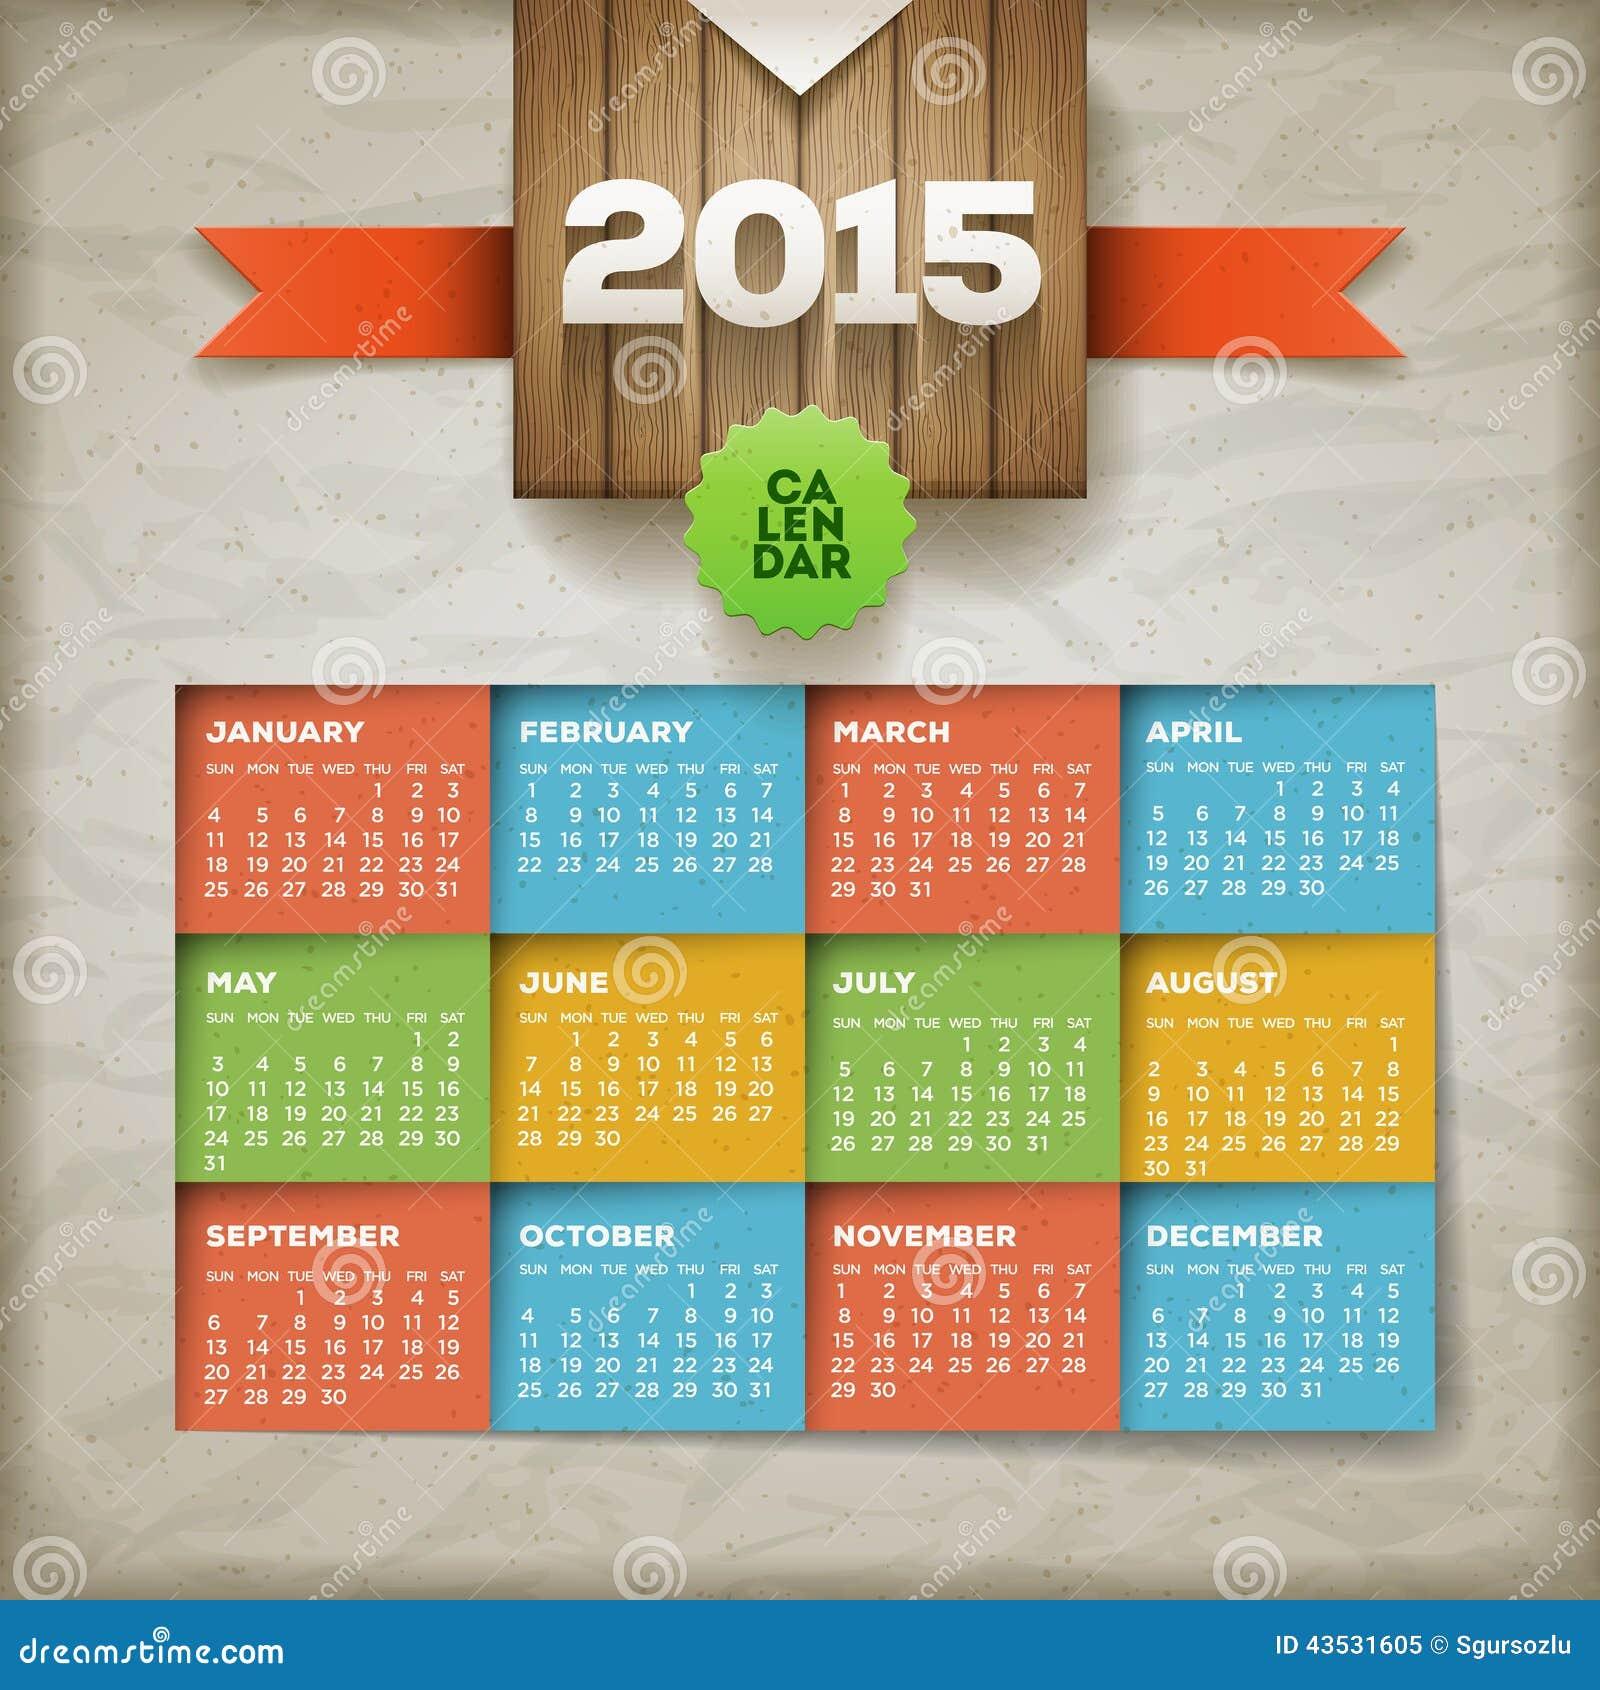 Календари на 2015 год - Векторный клипарт 2015 Calendars #1 - Stock Vectors 5 EPS + JPG Preview 37 Mb rar.